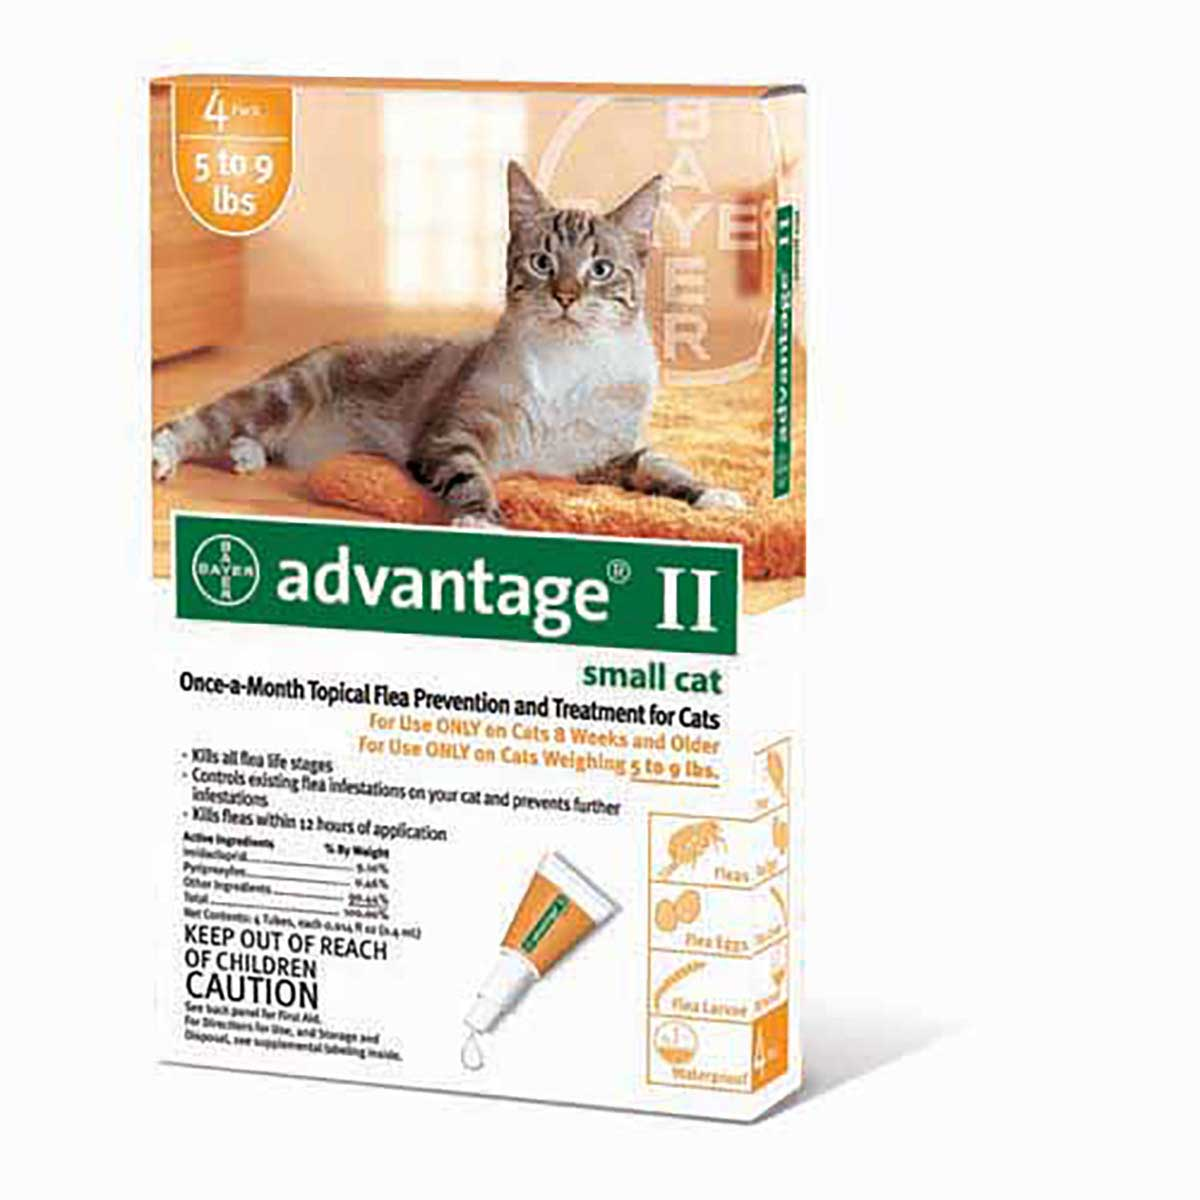 Advantage II Orange Flea Treatment Cats 9 lbs and Under - One Month